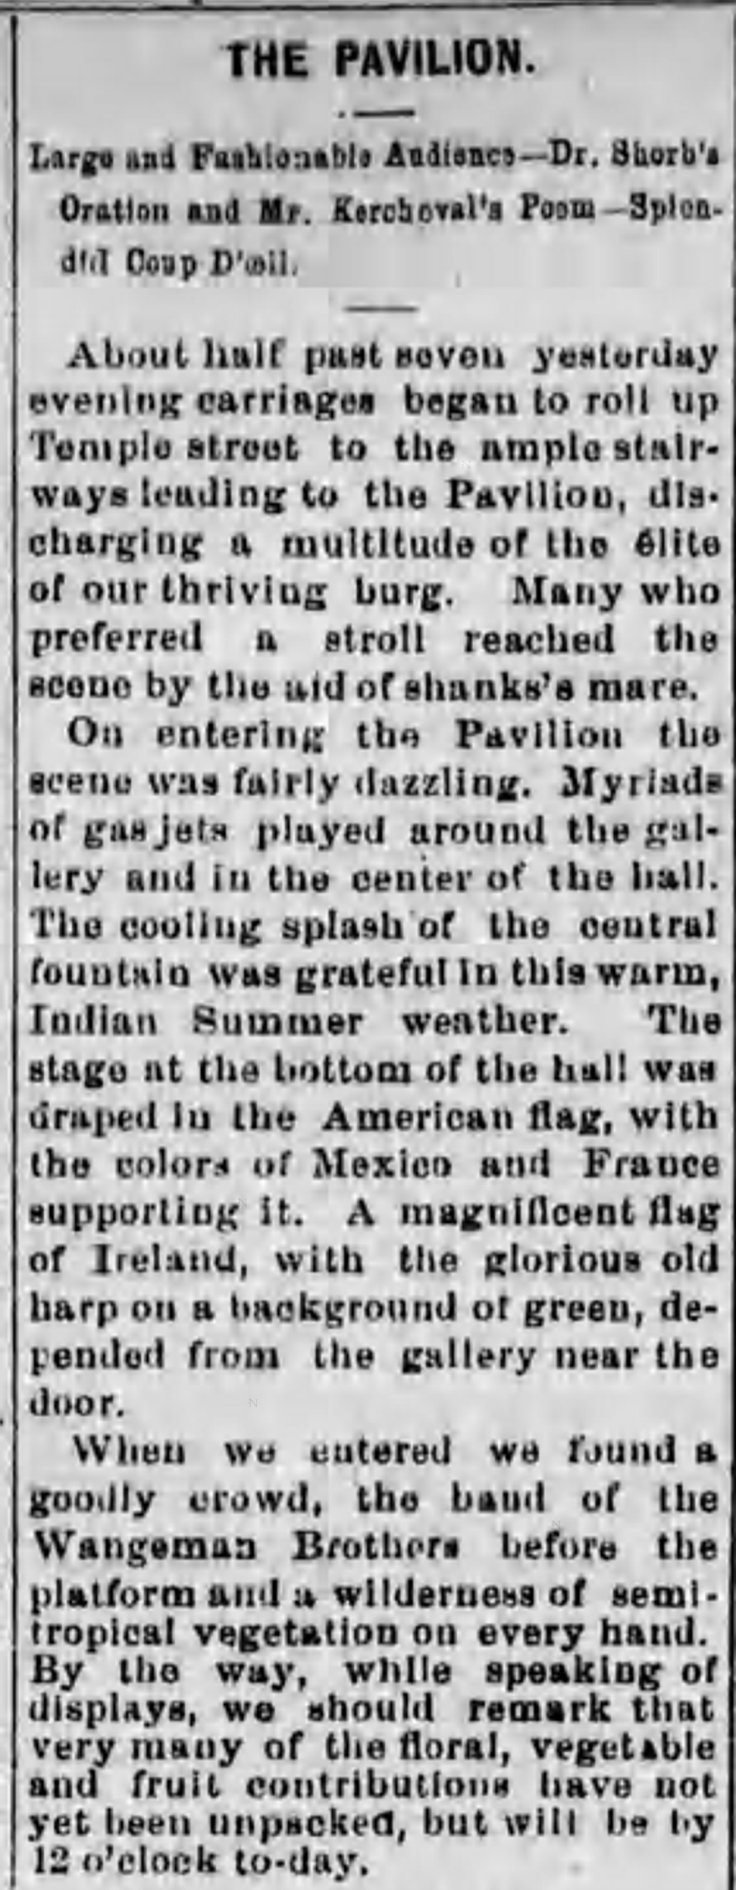 Horticultural Pavilion Opens LA_Herald_Oct_15__1878_